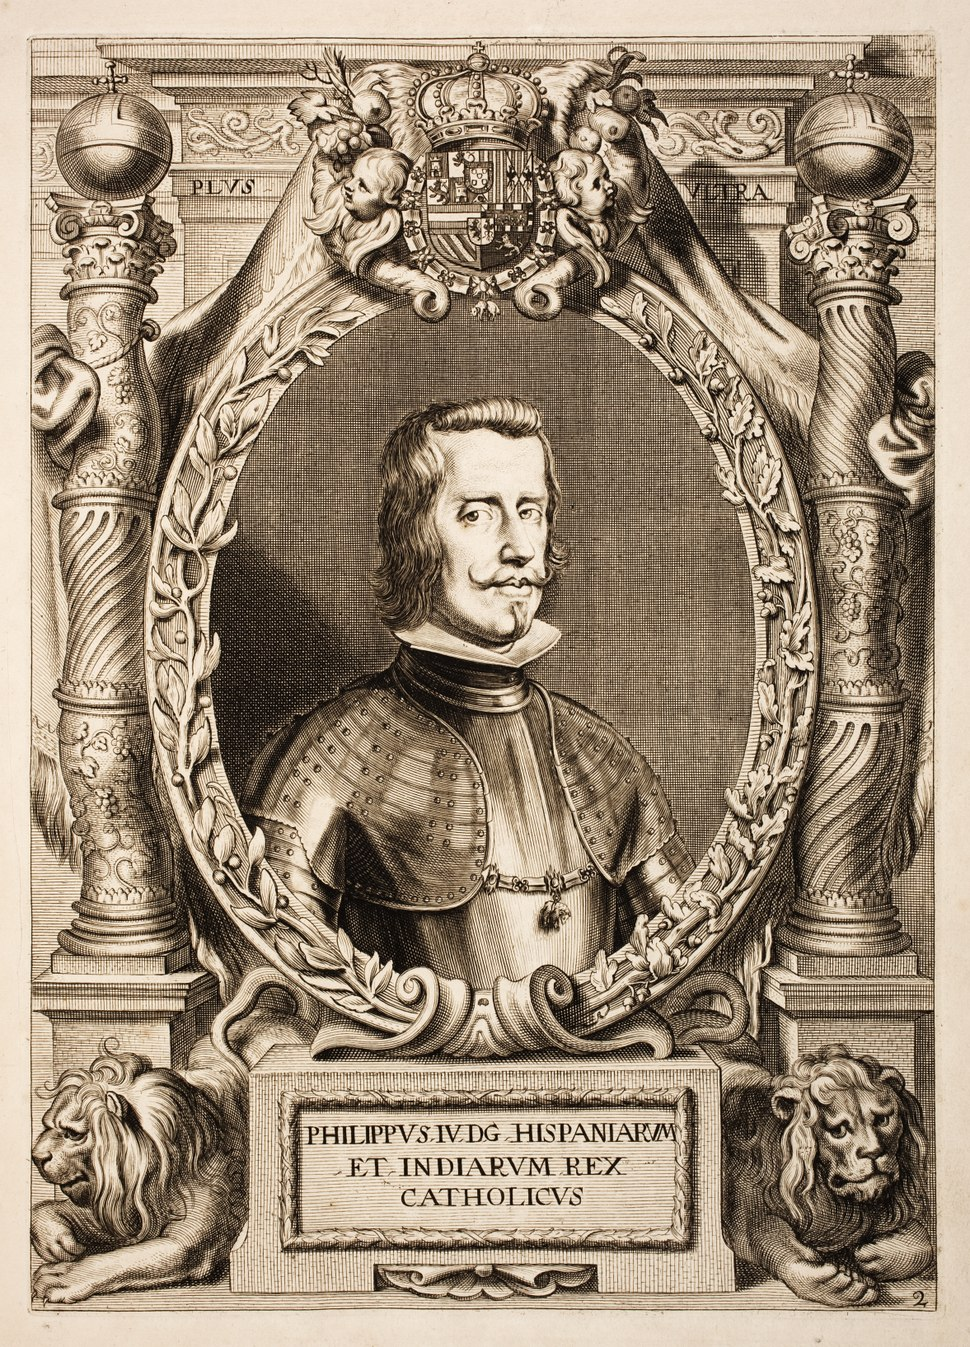 Anselmus-van-Hulle-Hommes-illustres MG 0429